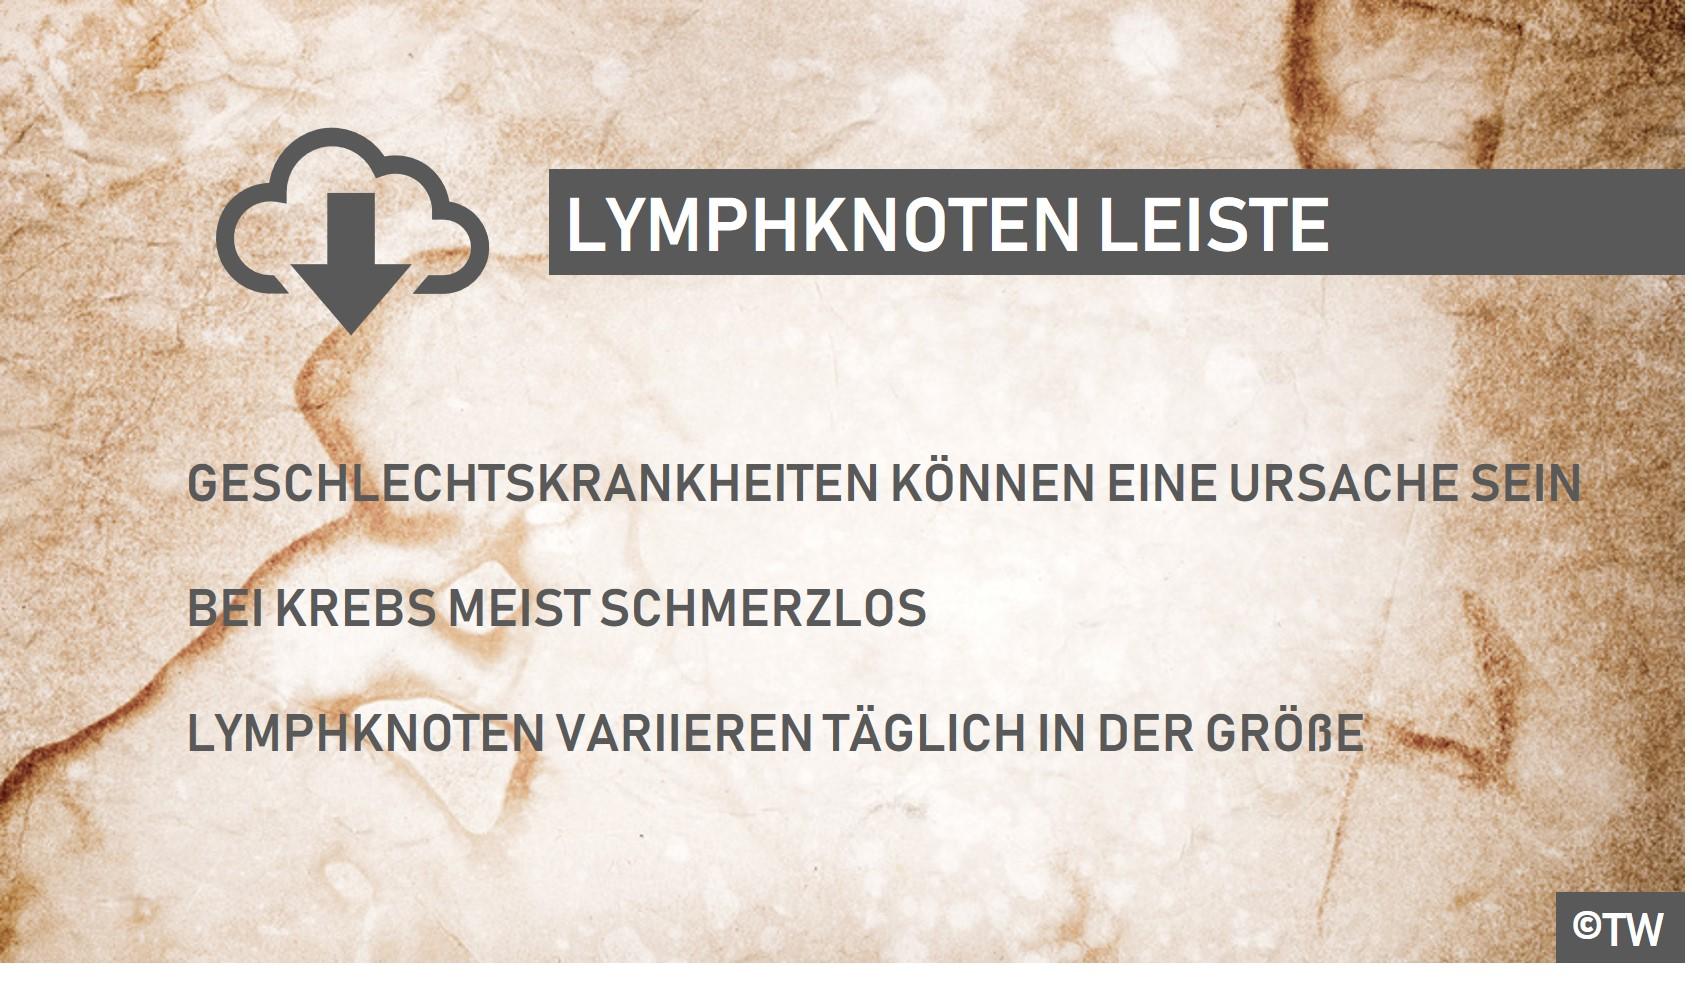 Lymphknoten leiste frau angeschwollene Schwellung in